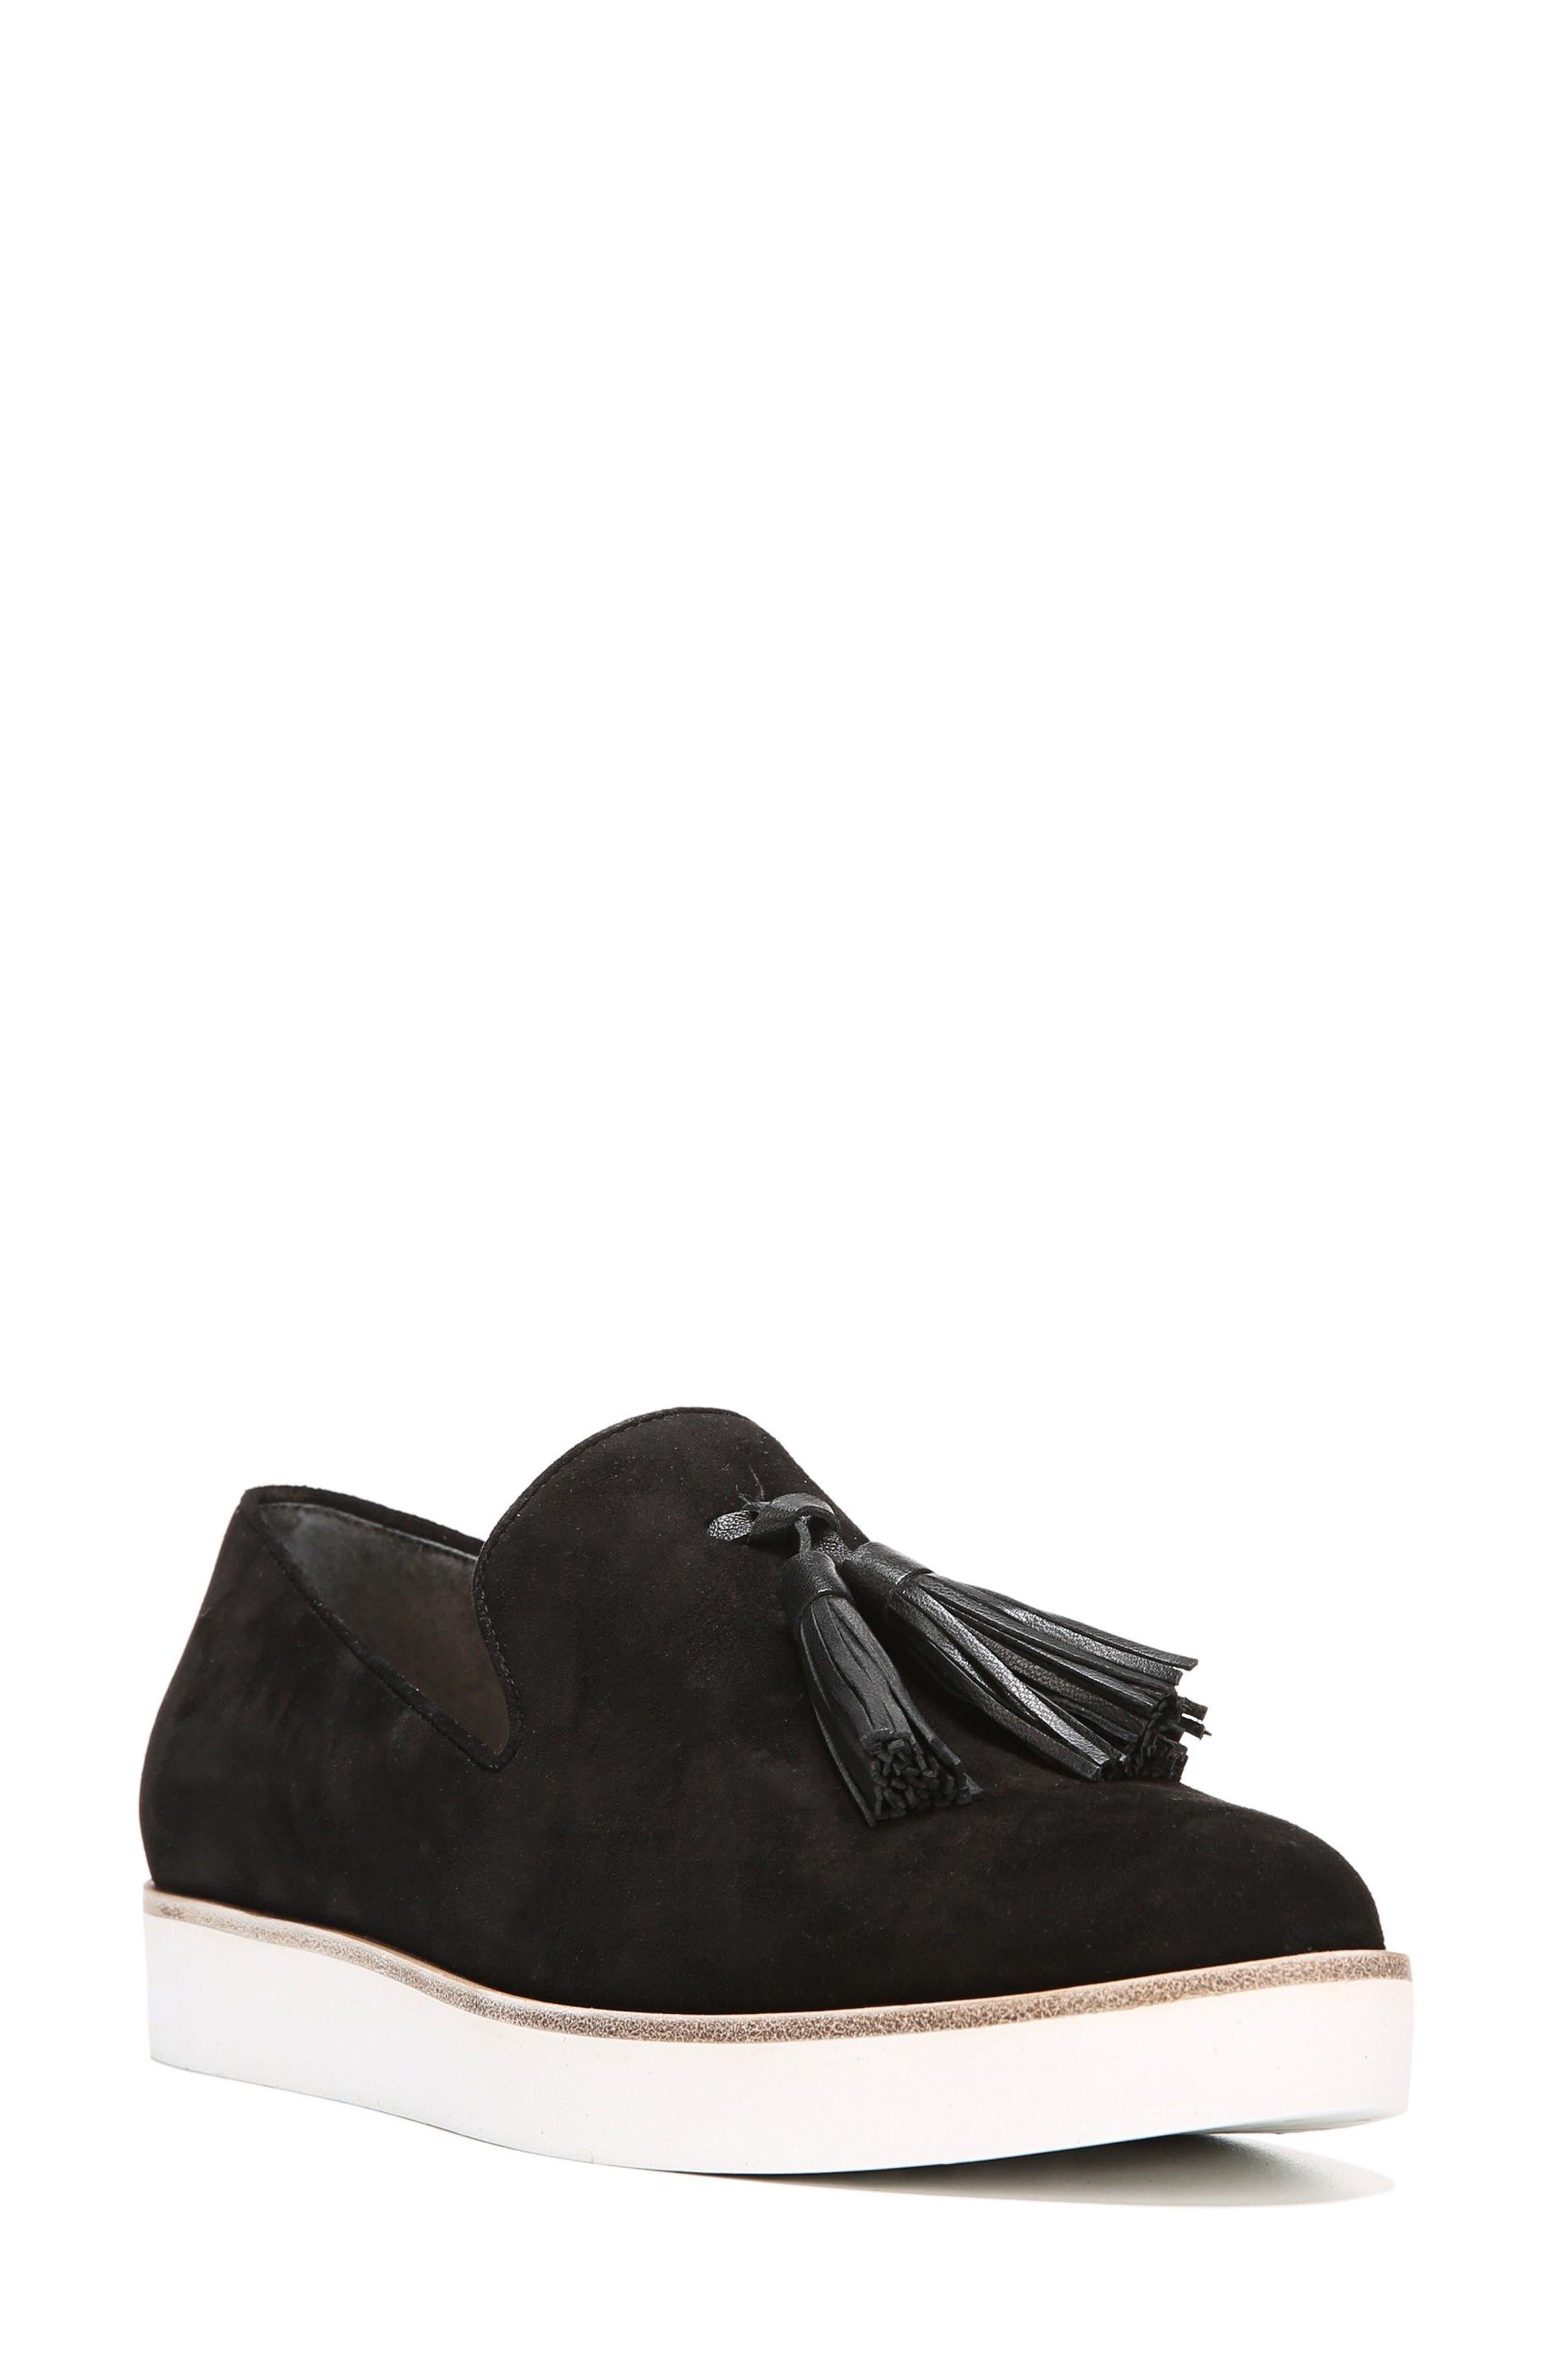 Toni Slip-On Sneaker,                         Main,                         color, Black Suede